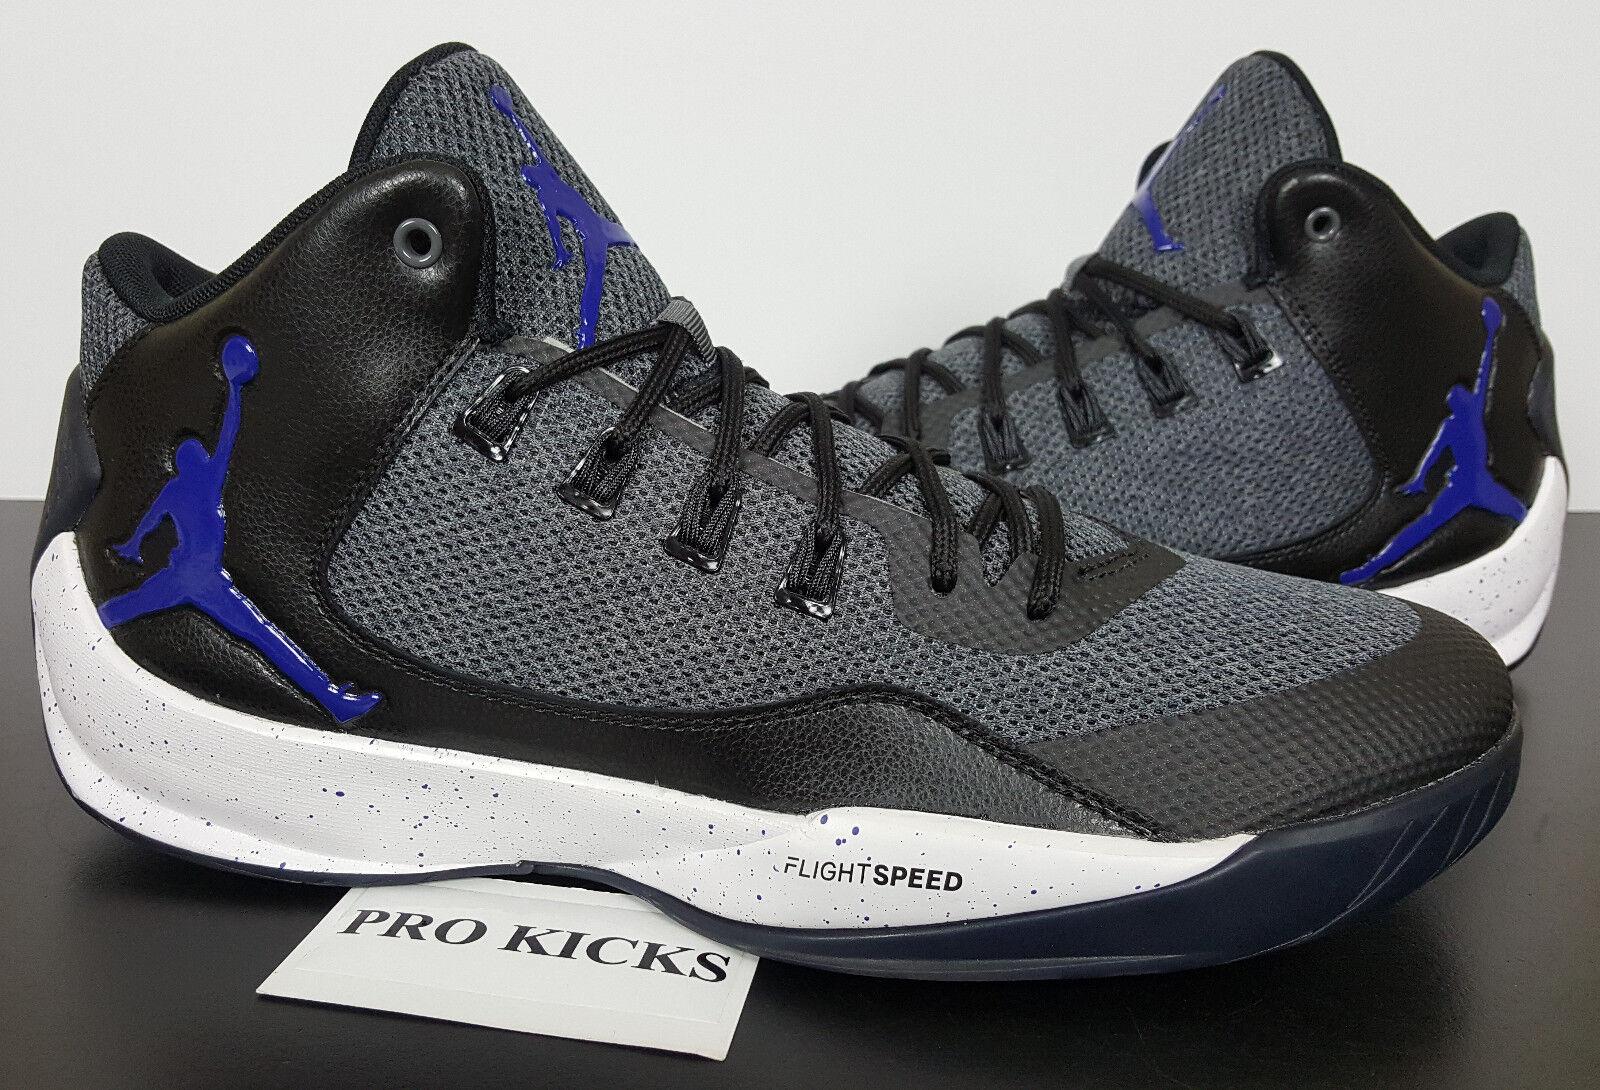 new products 7555e 8f8a5 Nike Nike Nike Air Jordan Rising 2 Basketball negro Concord blanco nuevo  844065-005 reduccion Primero que nada y para ...